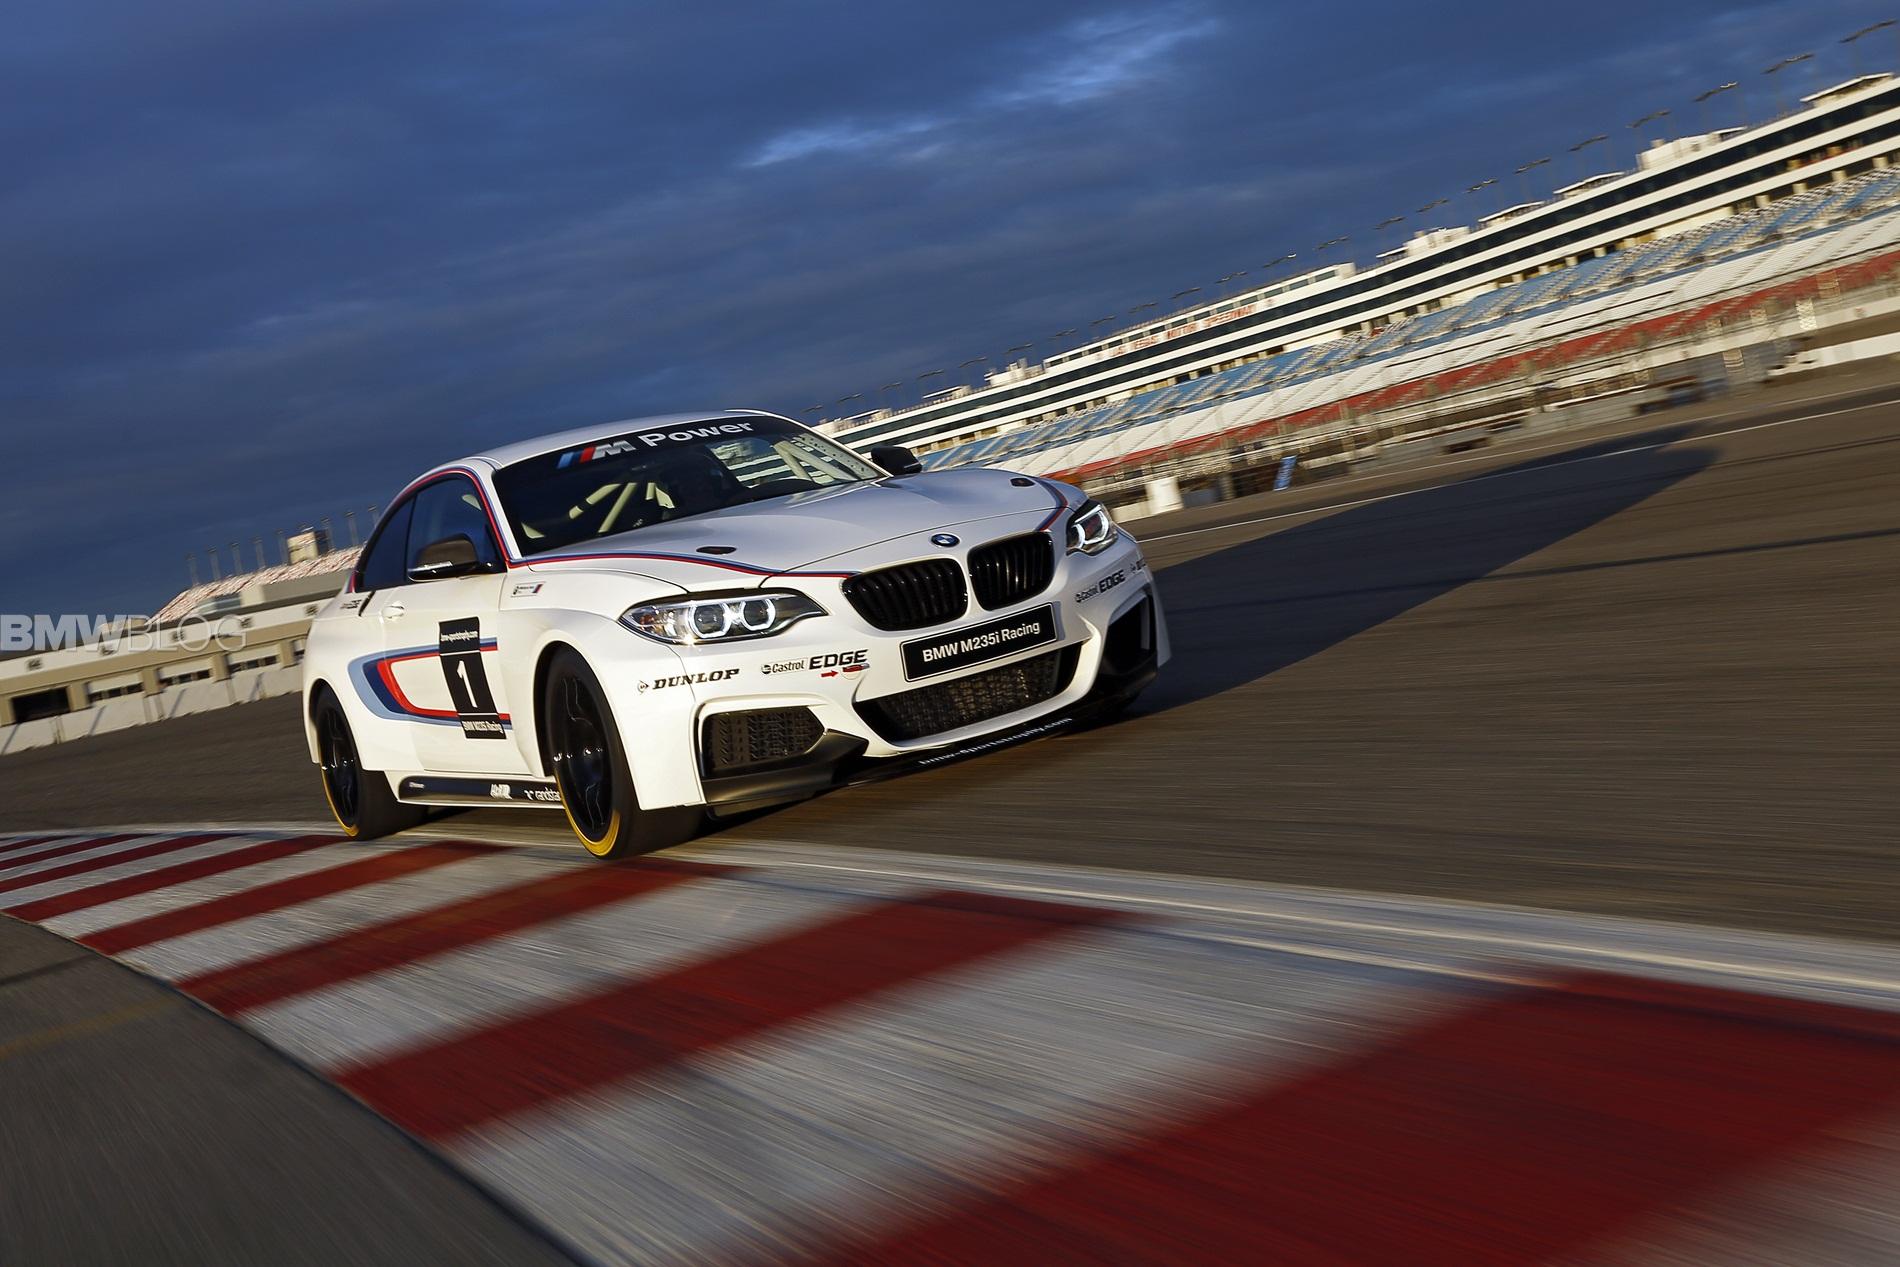 bmw m235i race car track 20